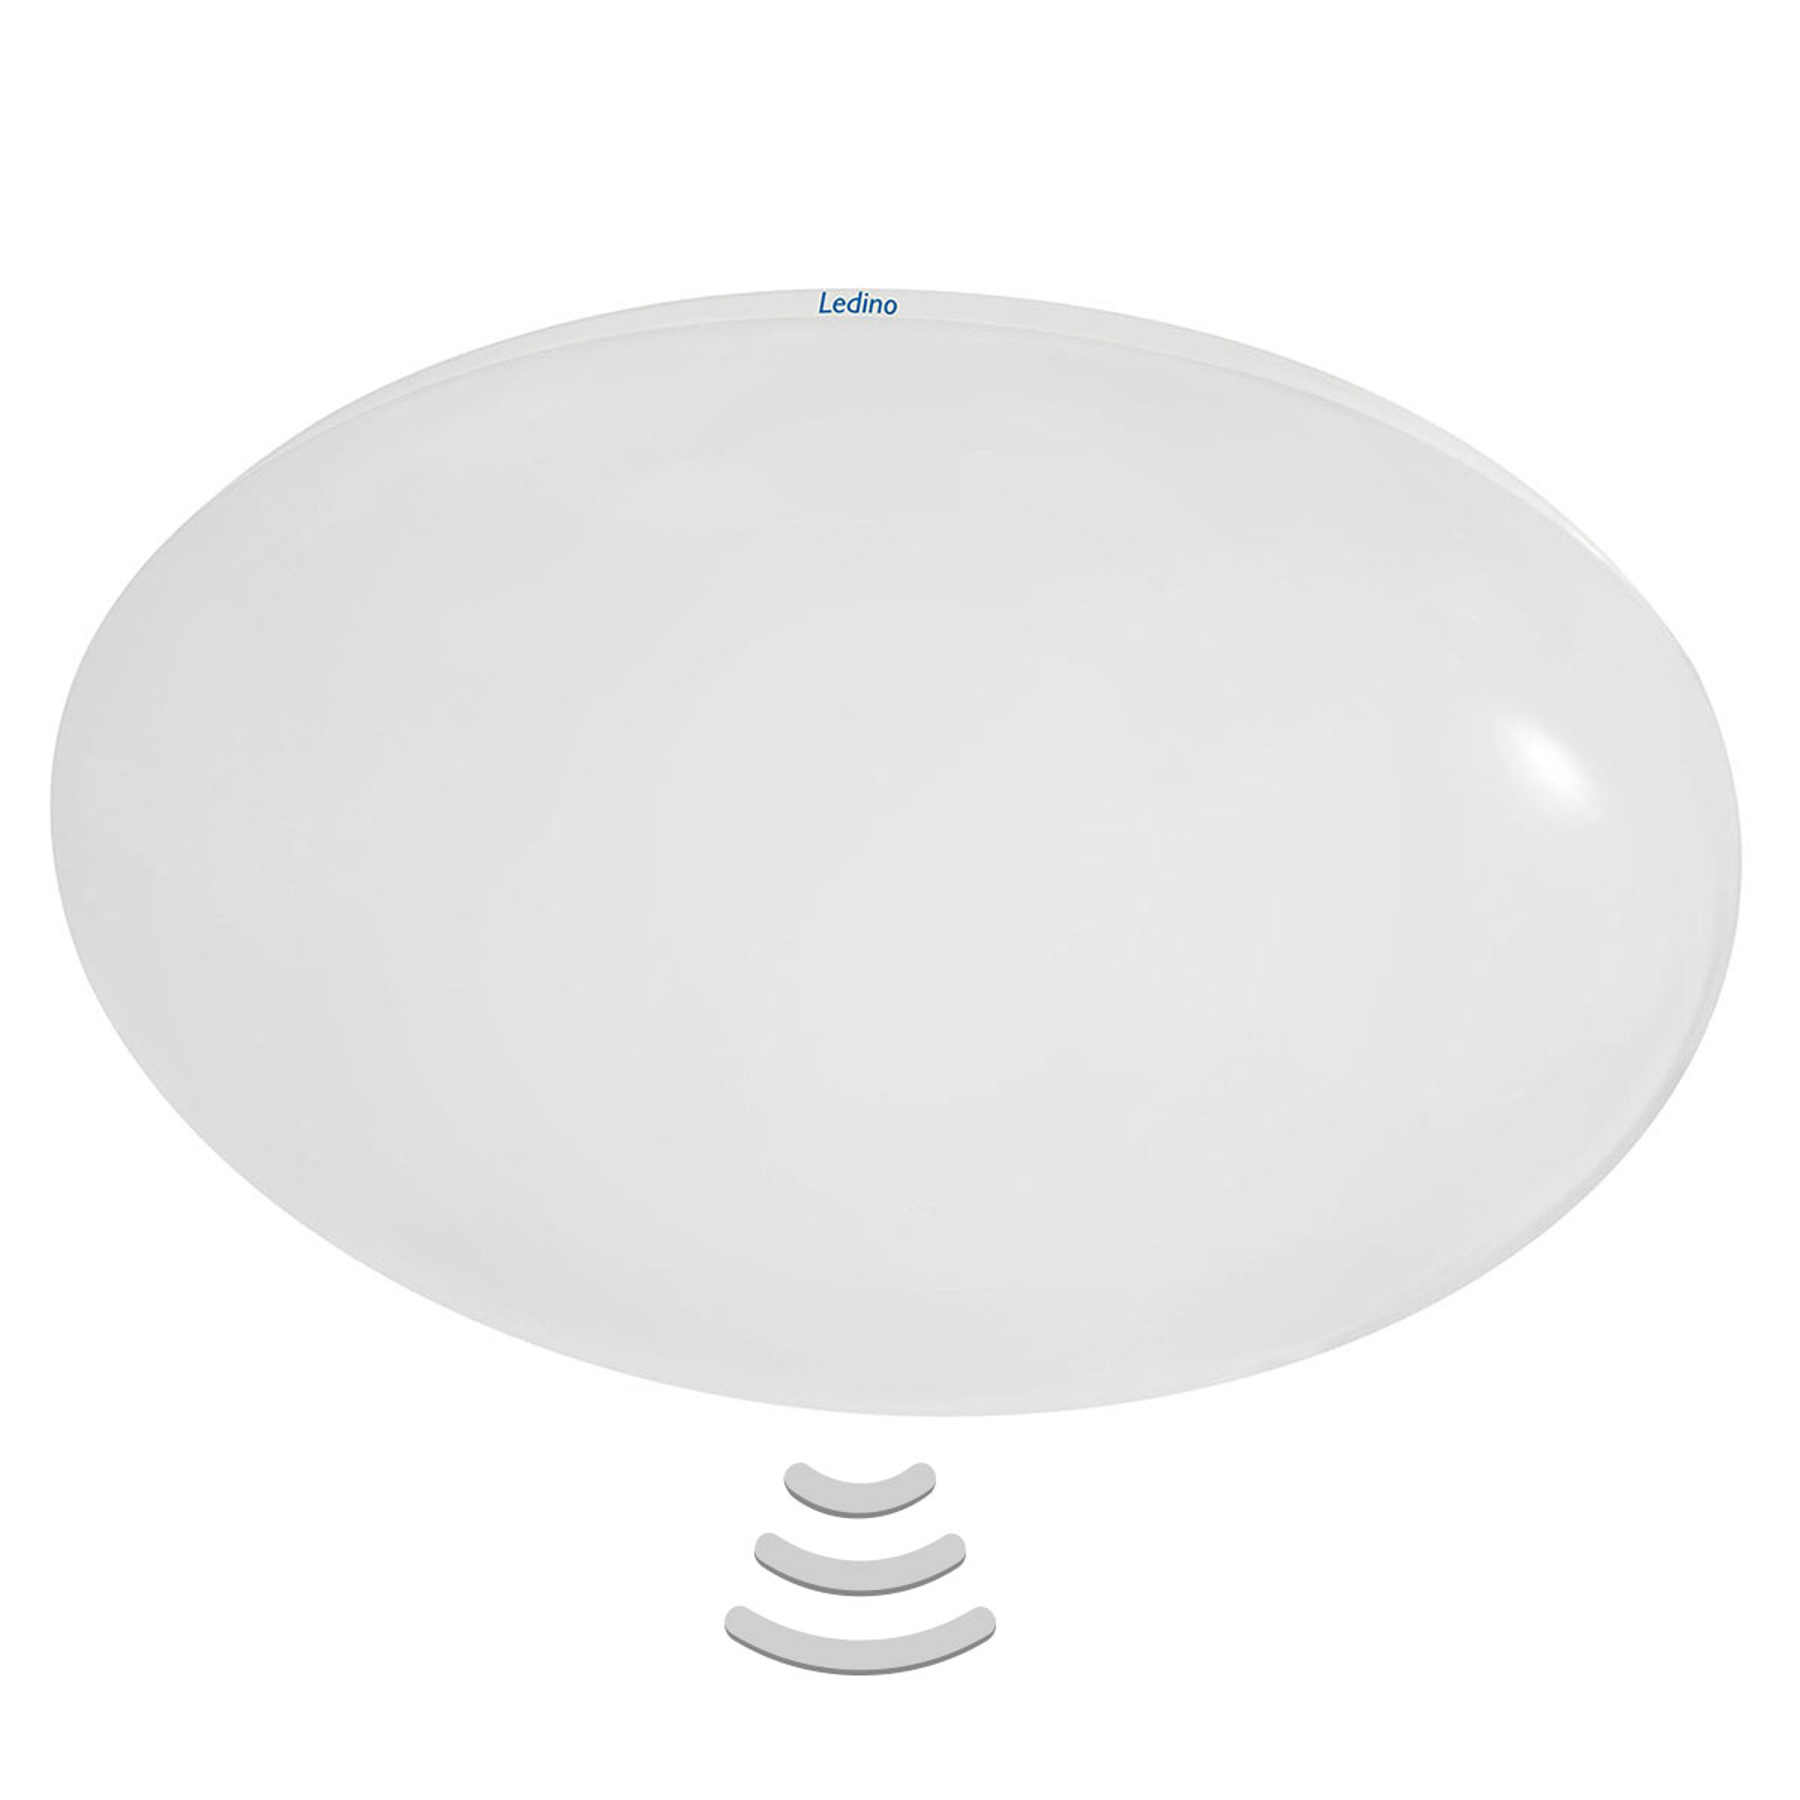 Lampa sufitowa LED Altona, HF, 4000 K 36cm